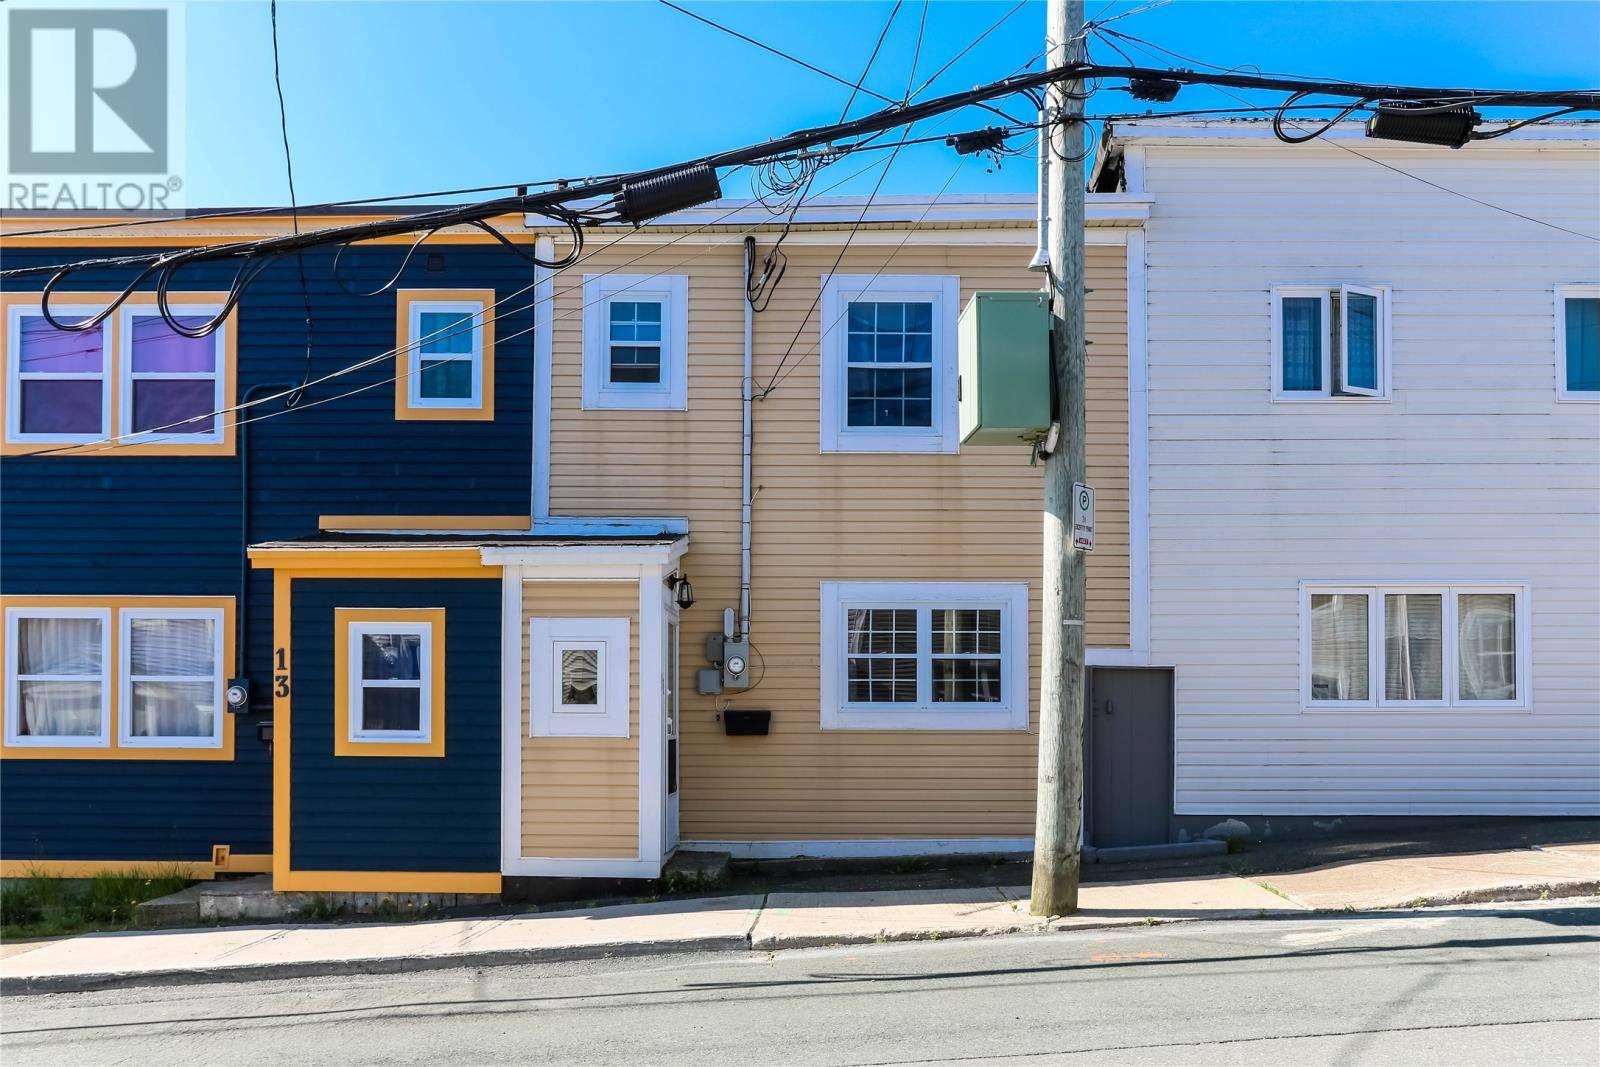 House for sale at 15 Coronation St St. John's Newfoundland - MLS: 1200334